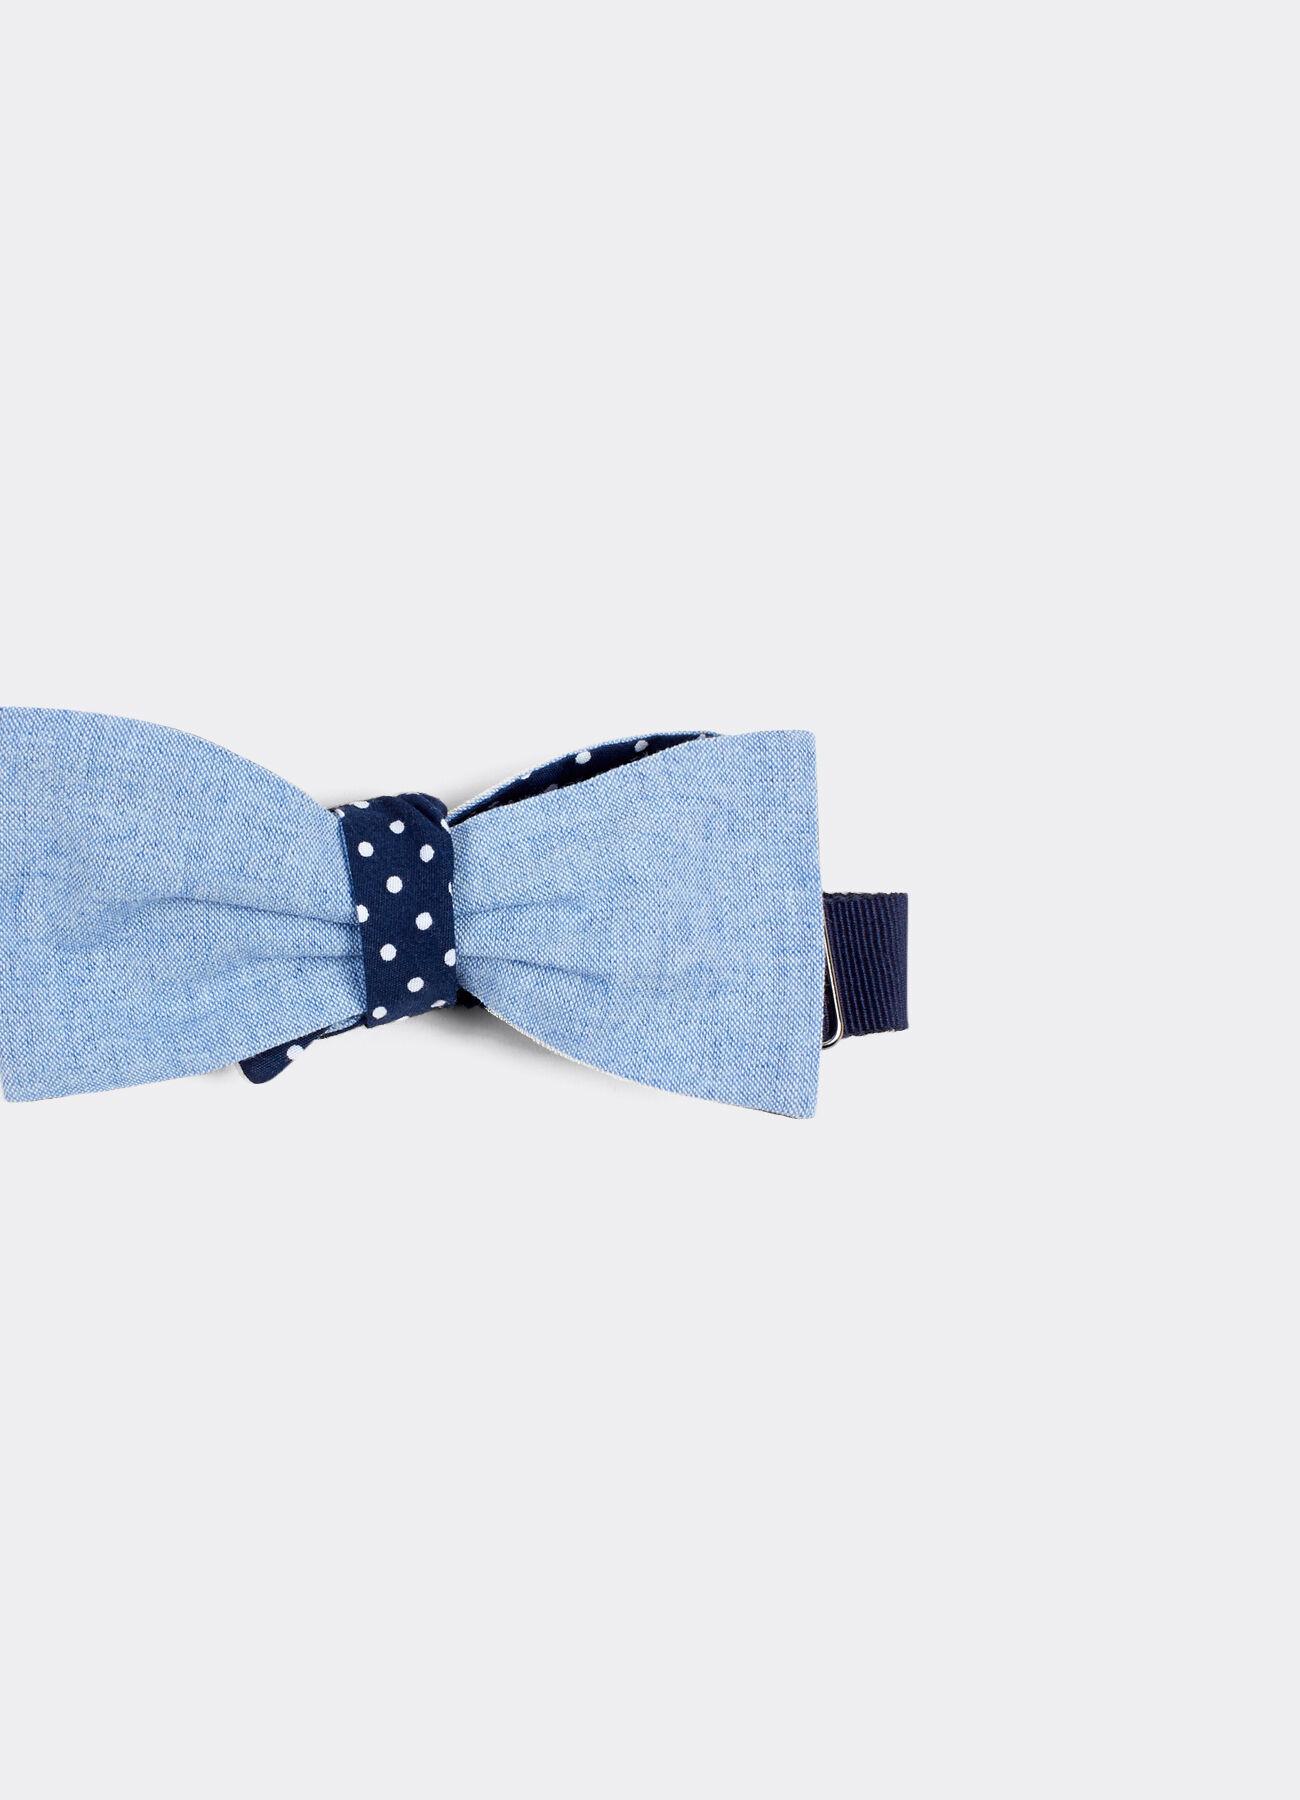 noeud papillon le flageolet made in france bleu marine fantaisie homme jules. Black Bedroom Furniture Sets. Home Design Ideas